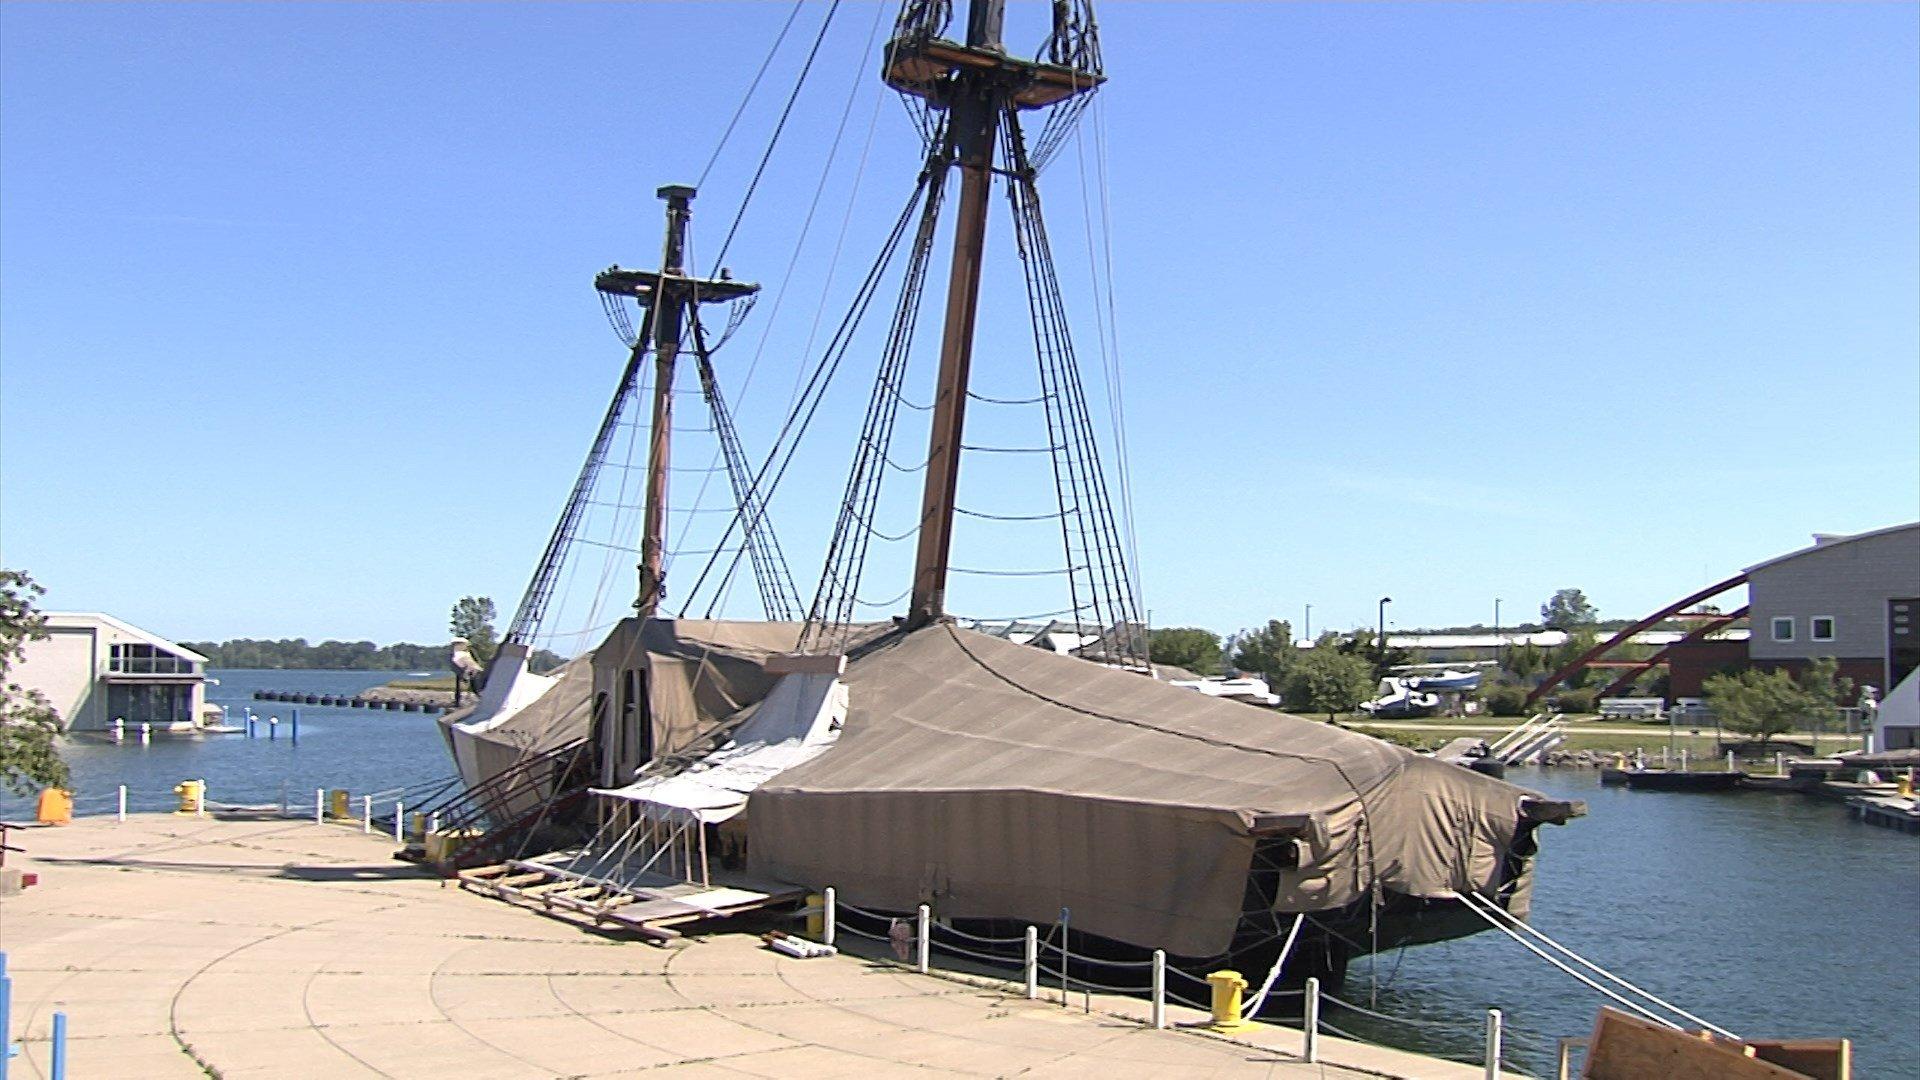 Brig Niagara Halloween 2020 Brig Niagara Docked Due to Pandemic: Uncertain is Ship Will Sail